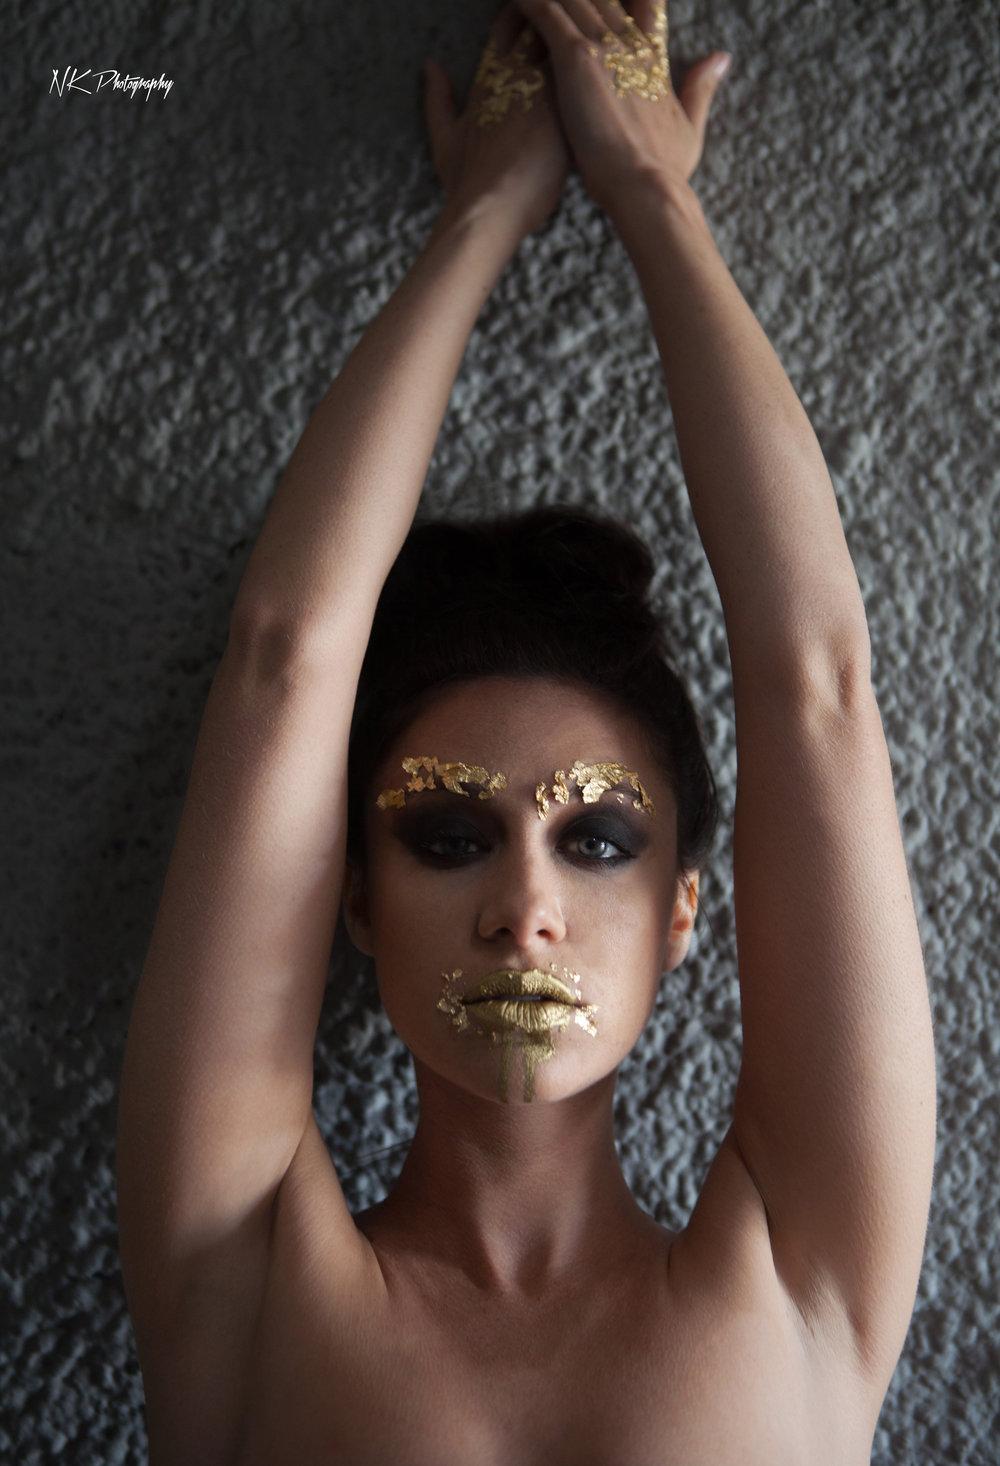 Natalie Kagasoff - Photographer